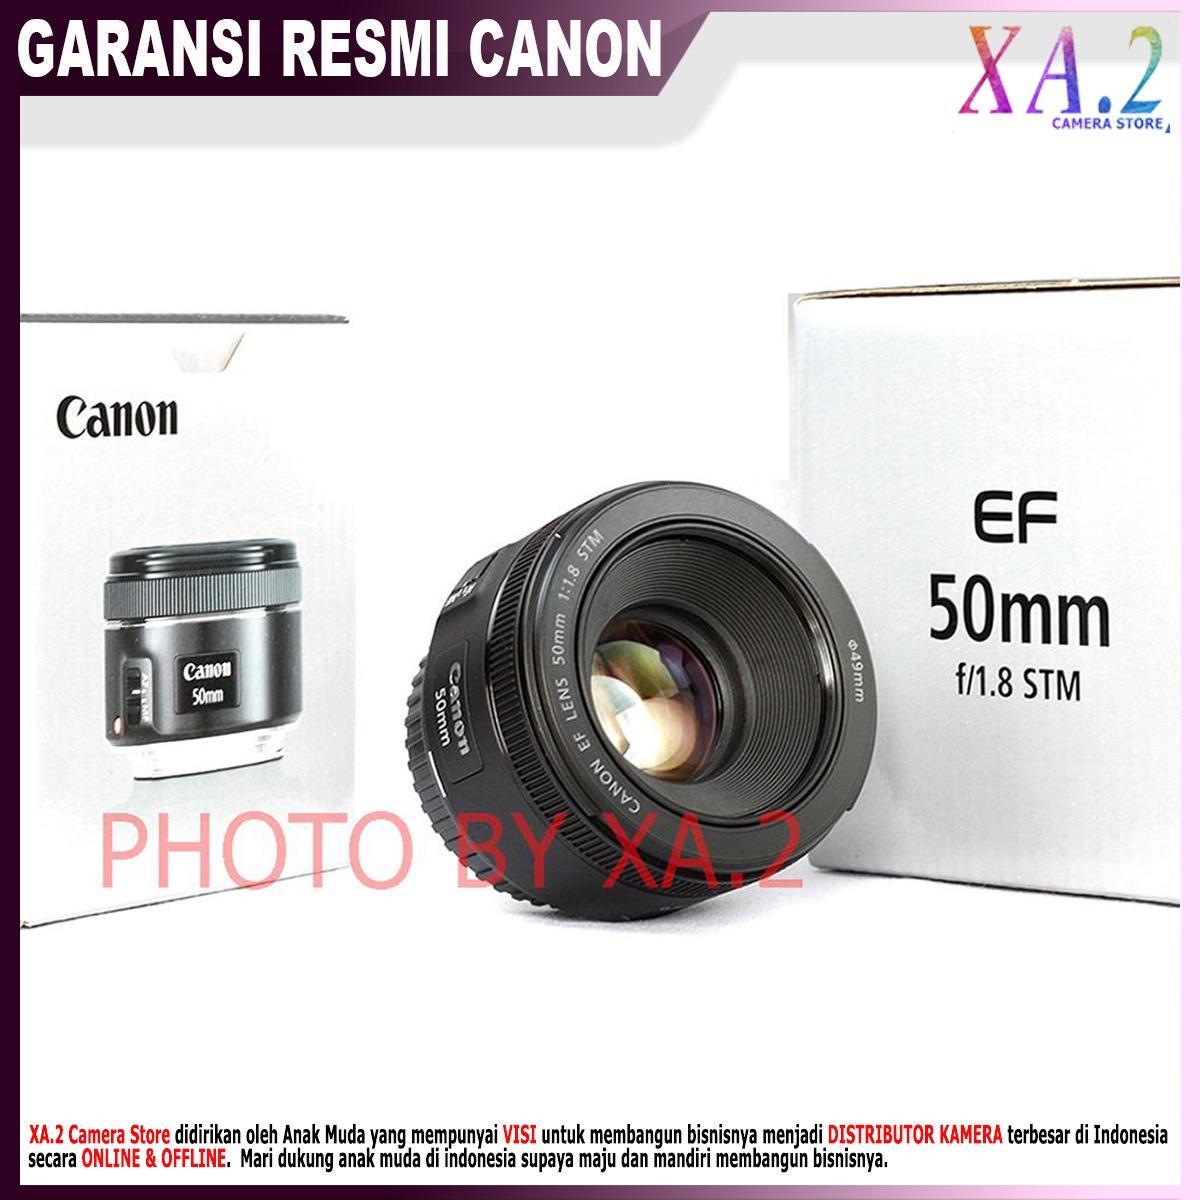 LENSA FIX CANON EF 50MM F/1.8 STM - GARANSI RESMI 1 TAHUN